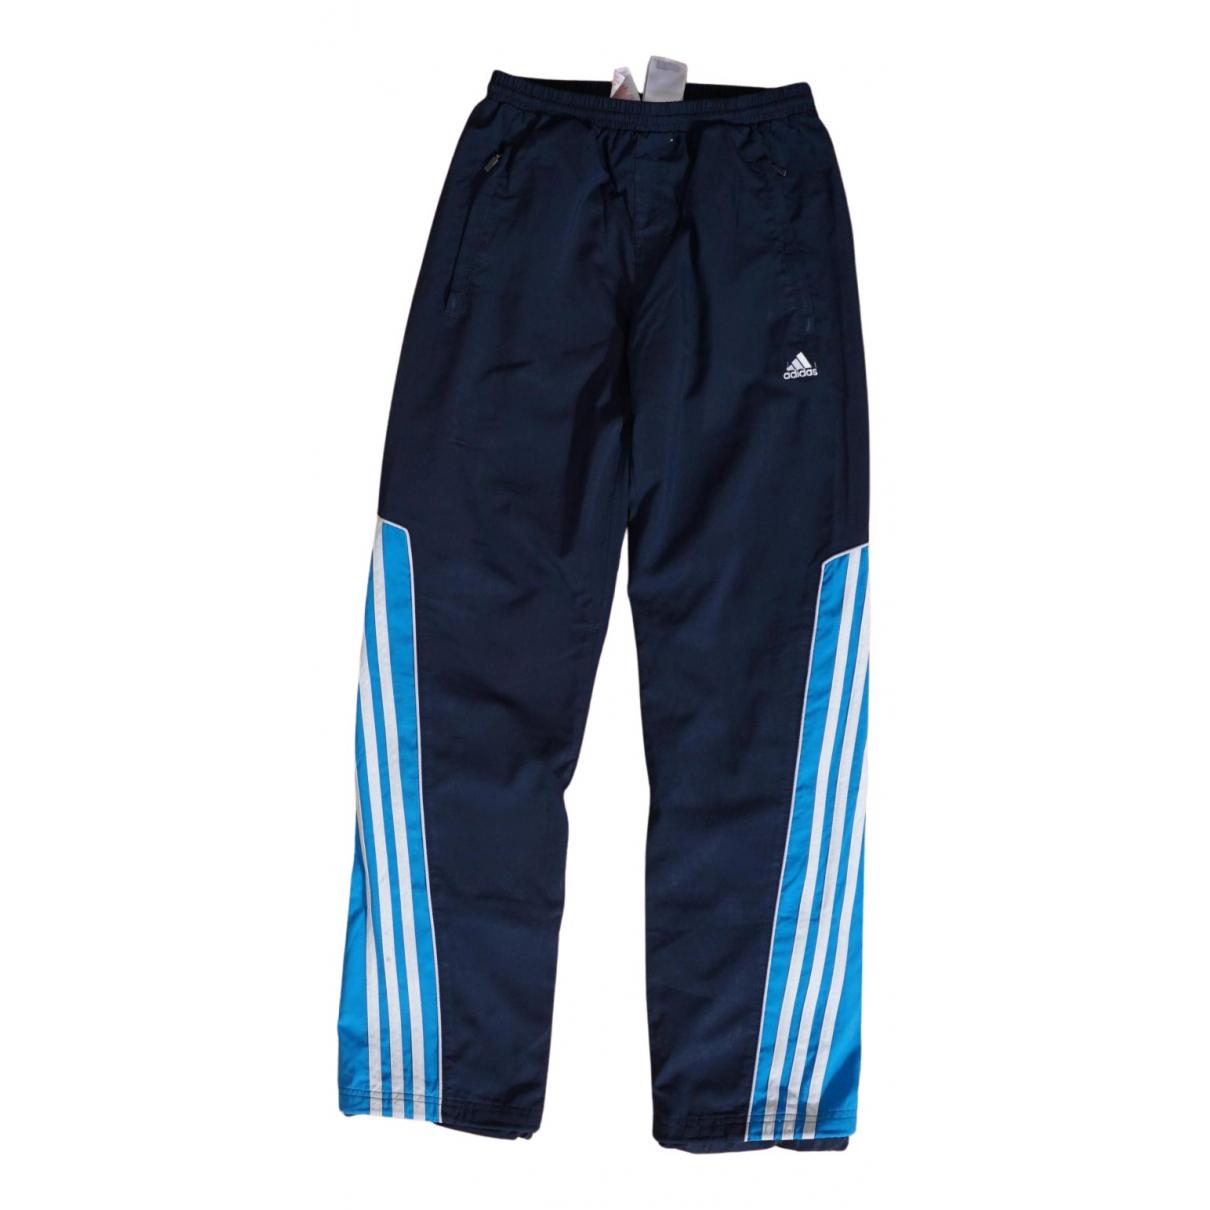 Adidas - Pantalon   pour enfant - marine